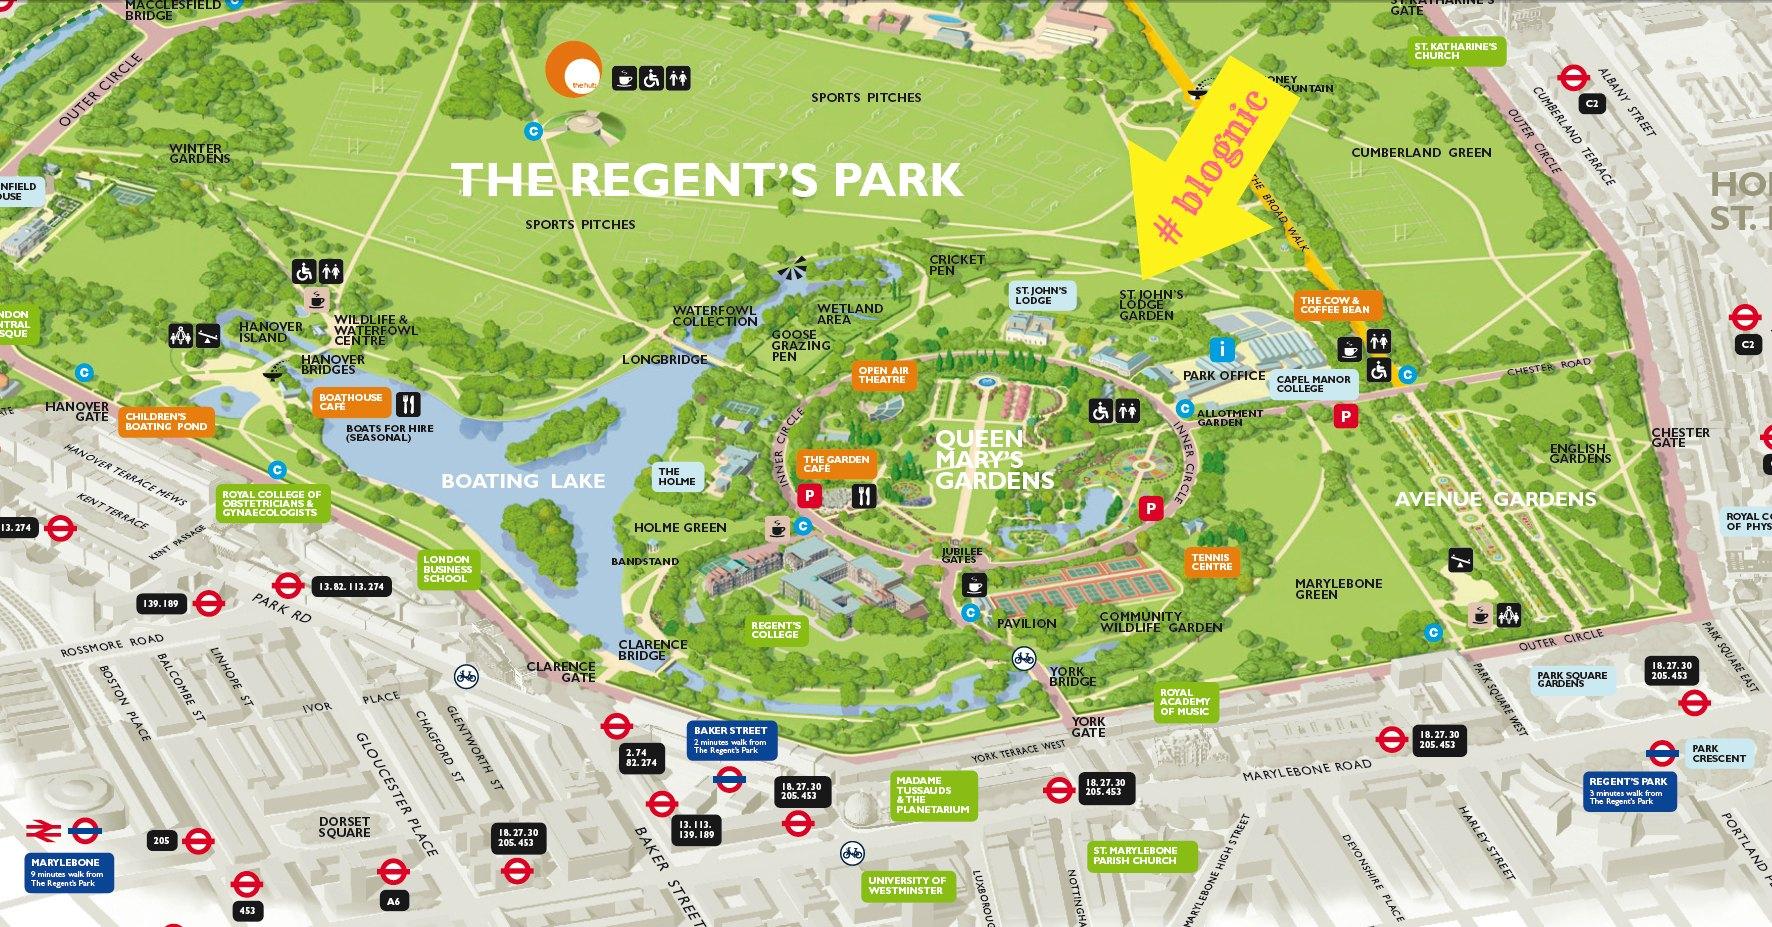 Location for Blognic 2013 St Johns Lodge Gardens Regents Park